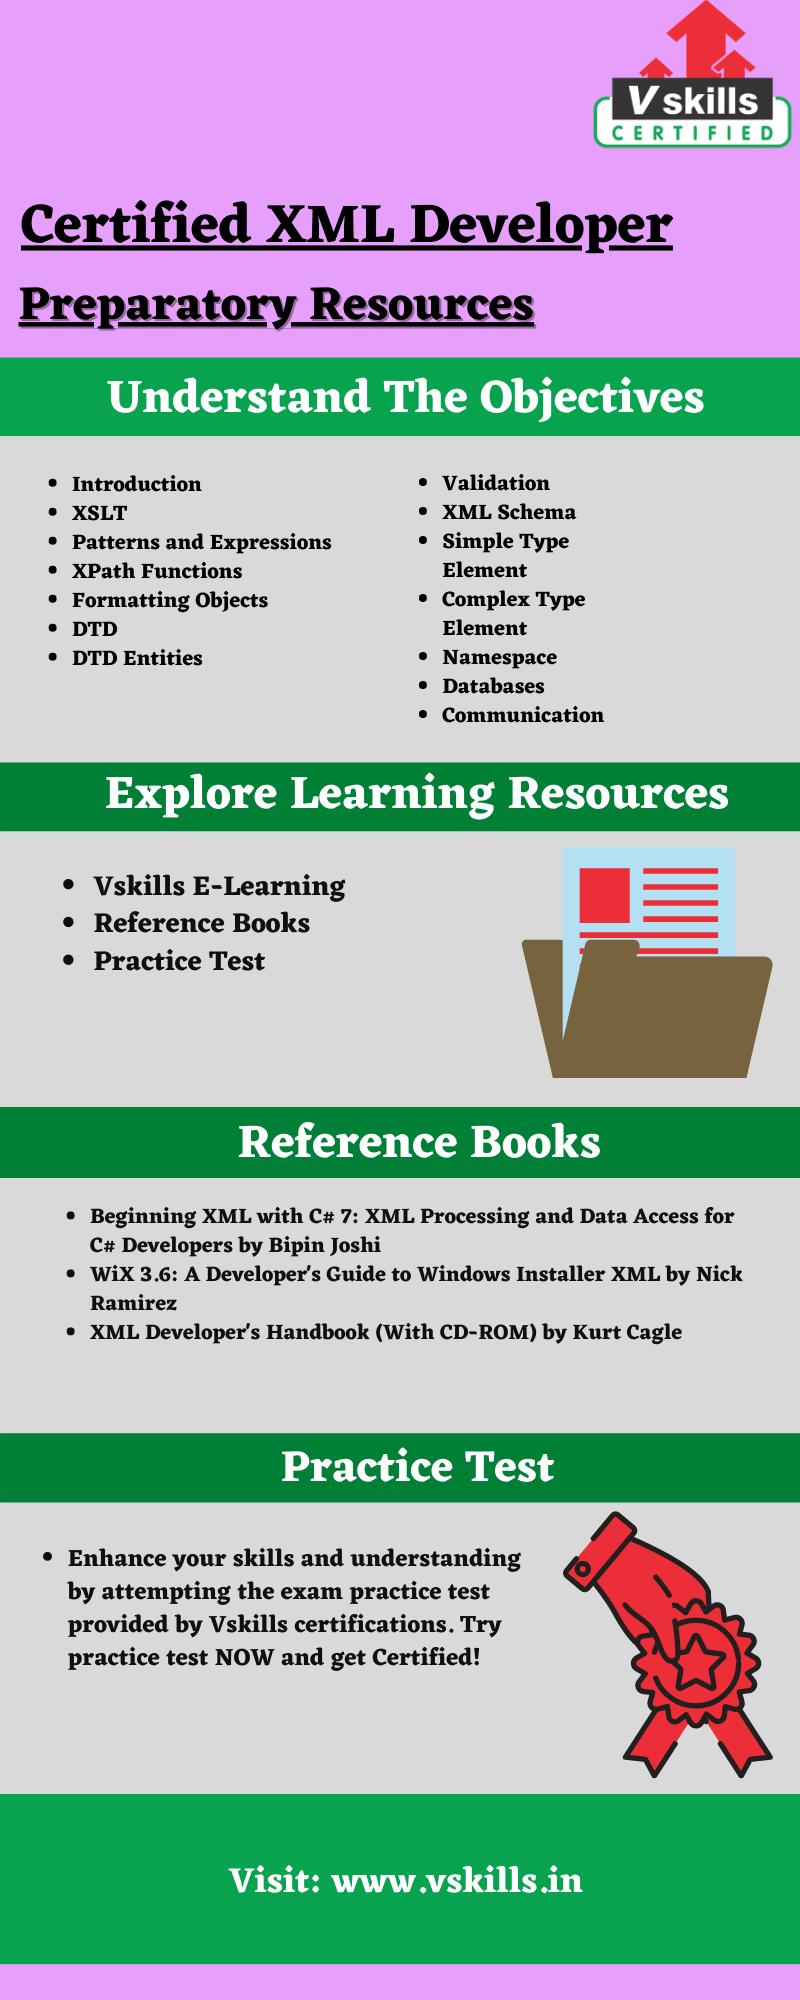 Certified XML Developer preparatory guide